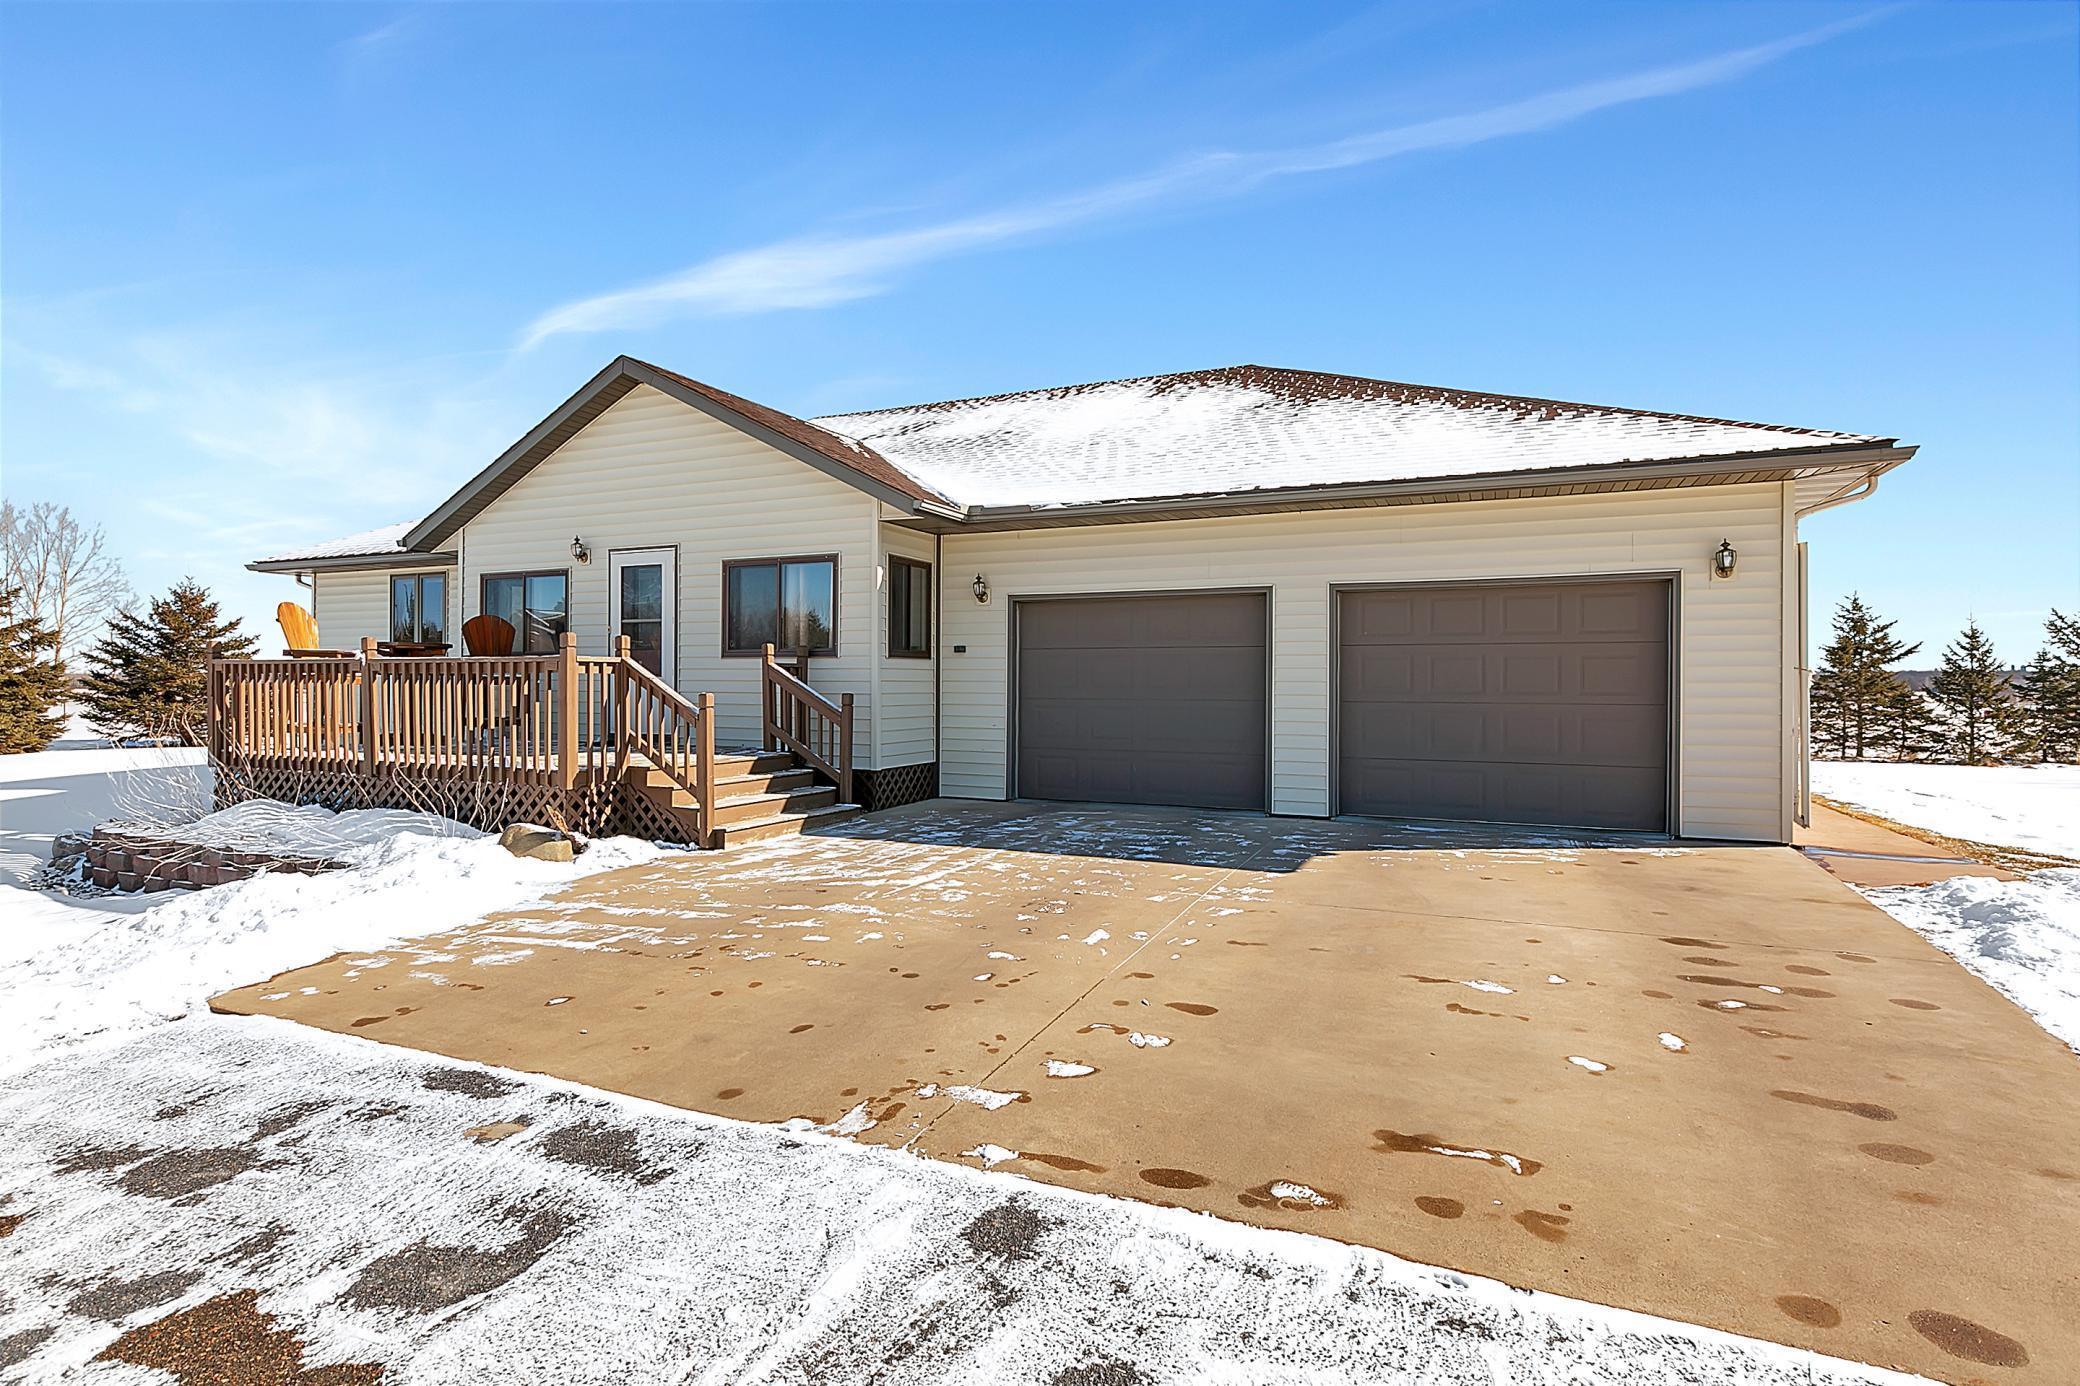 14946 Sandpiper Drive, Little Falls, MN 56345